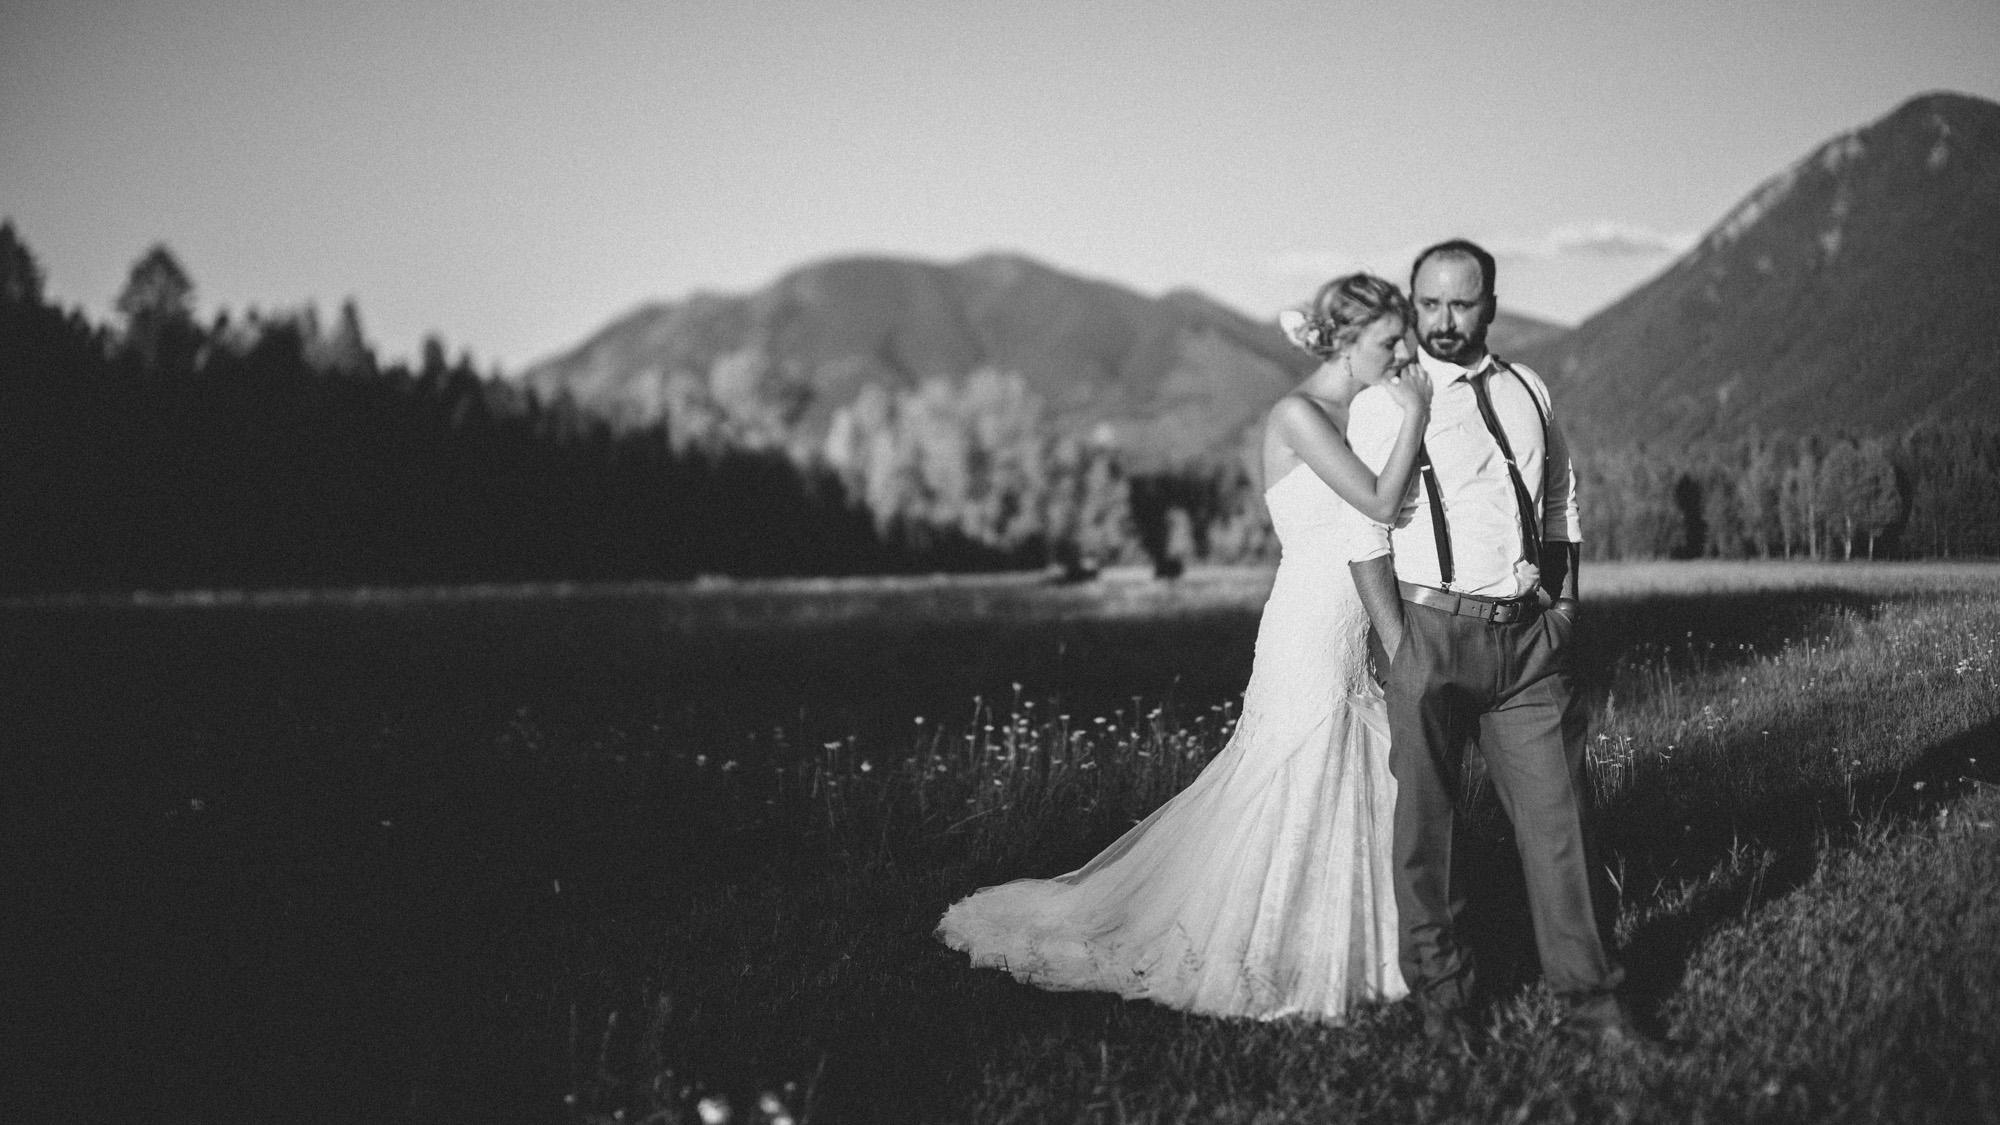 Montana_Wedding_Photos_alec_vanderboom-0128.jpg